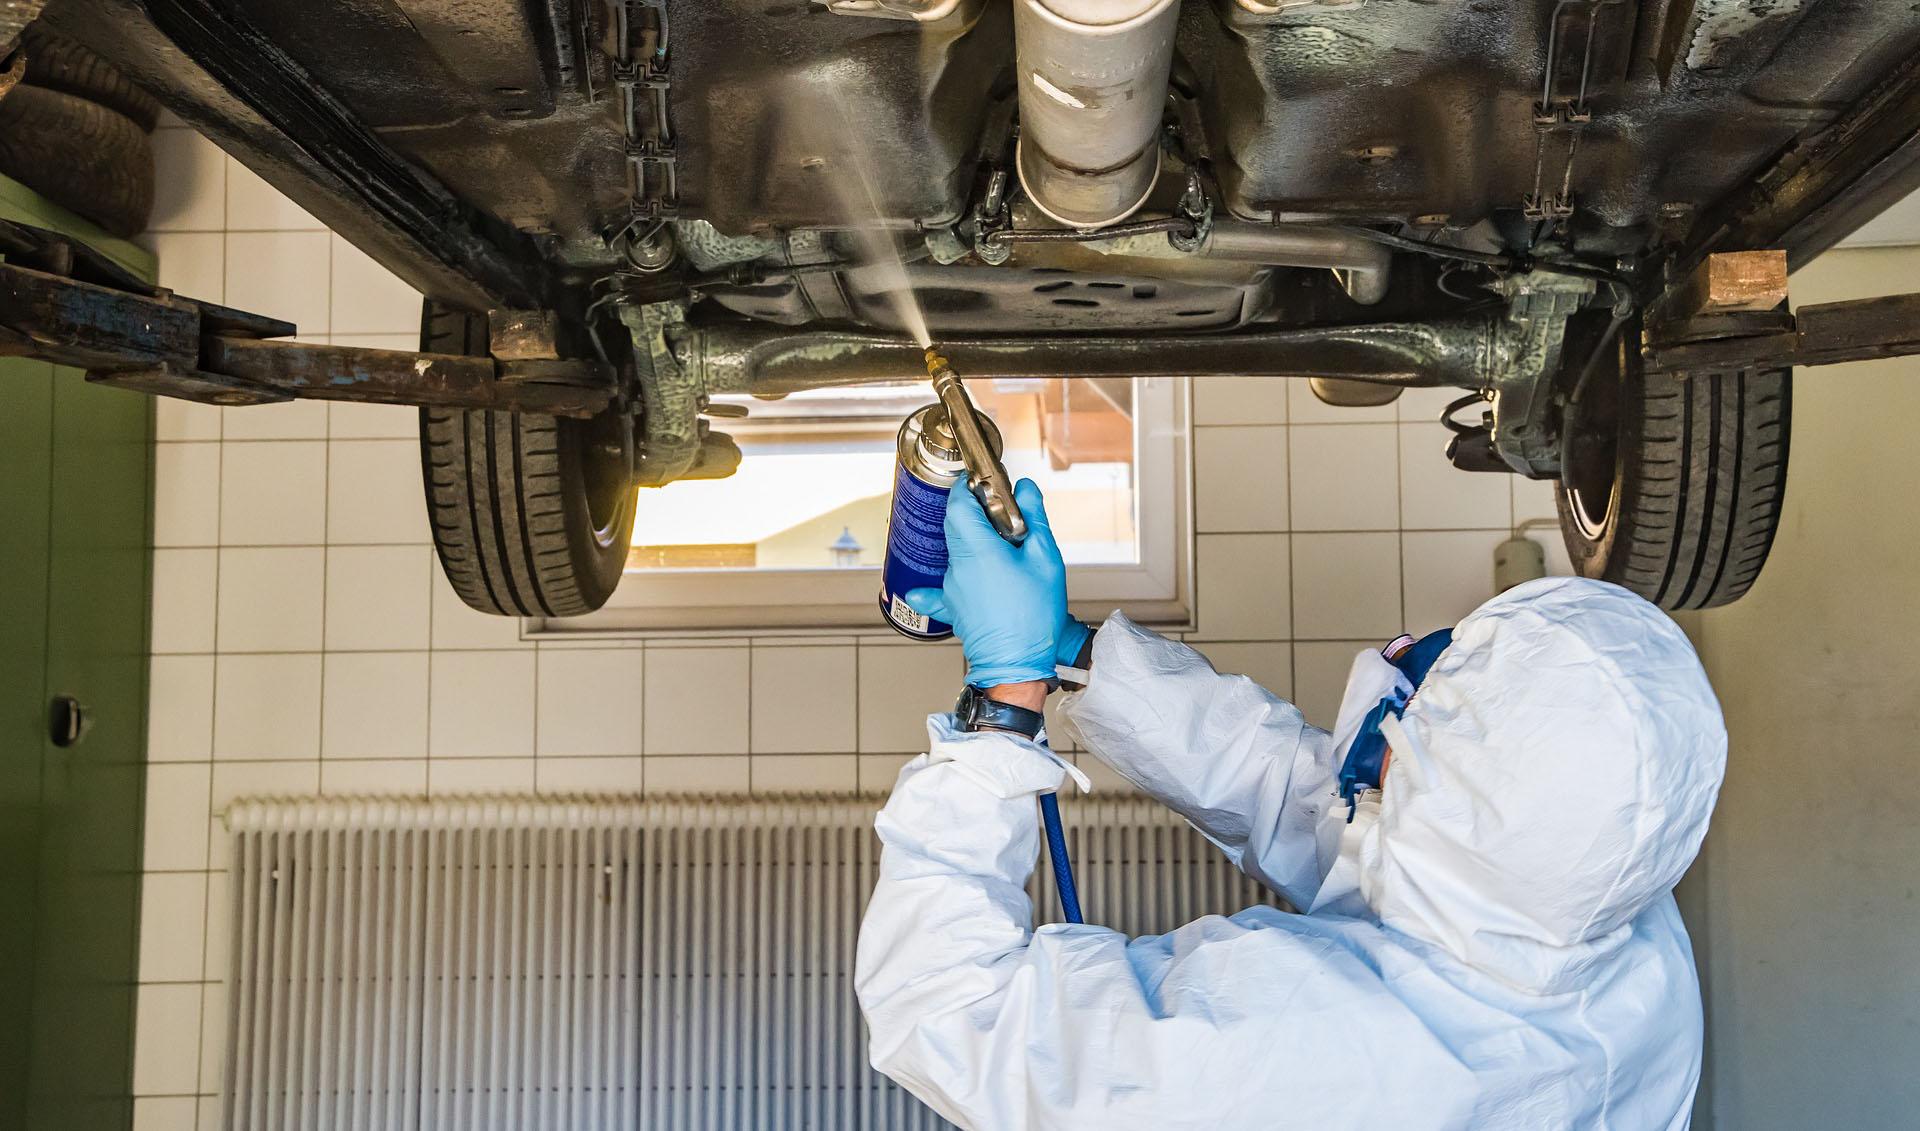 Car Repair During COVID 19 | Car Repair Installment Plan